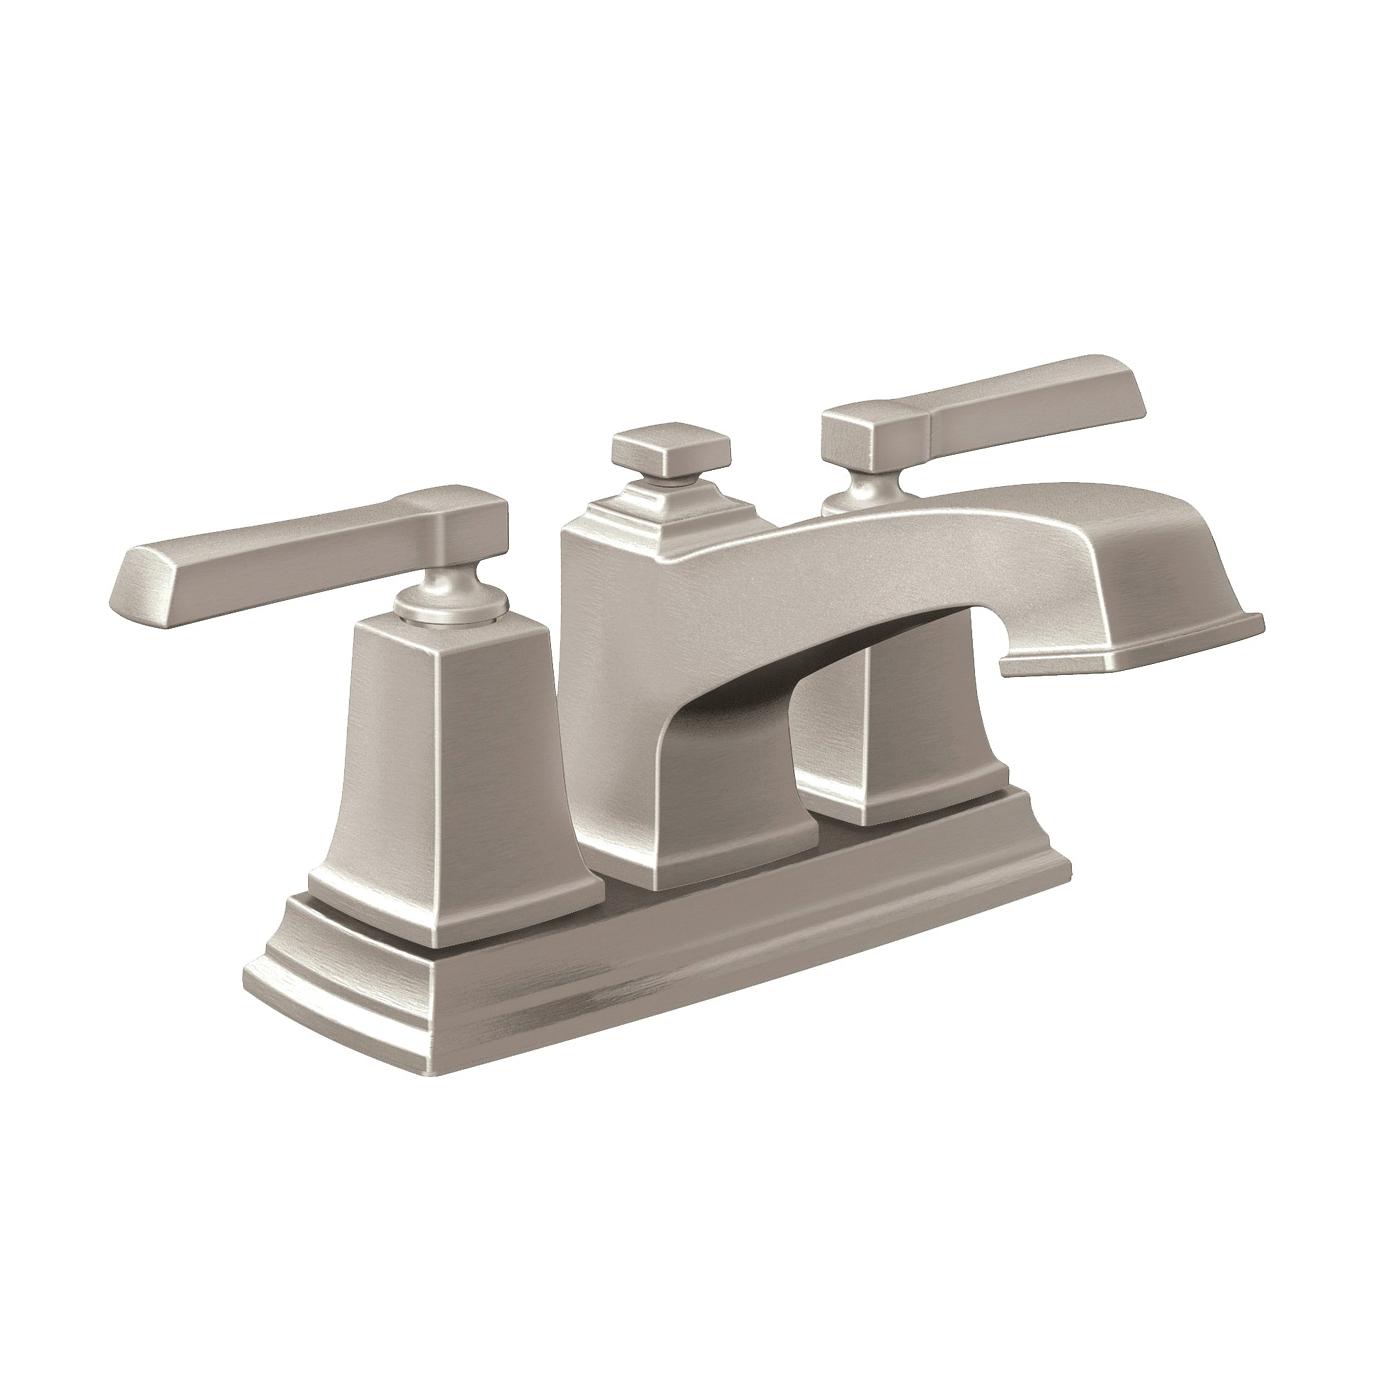 Picture of Moen Boardwalk WS84800SRN Bathroom Faucet, 1.2 gpm, 2-Faucet Handle, Metal, Brushed Nickel, Lever Handle